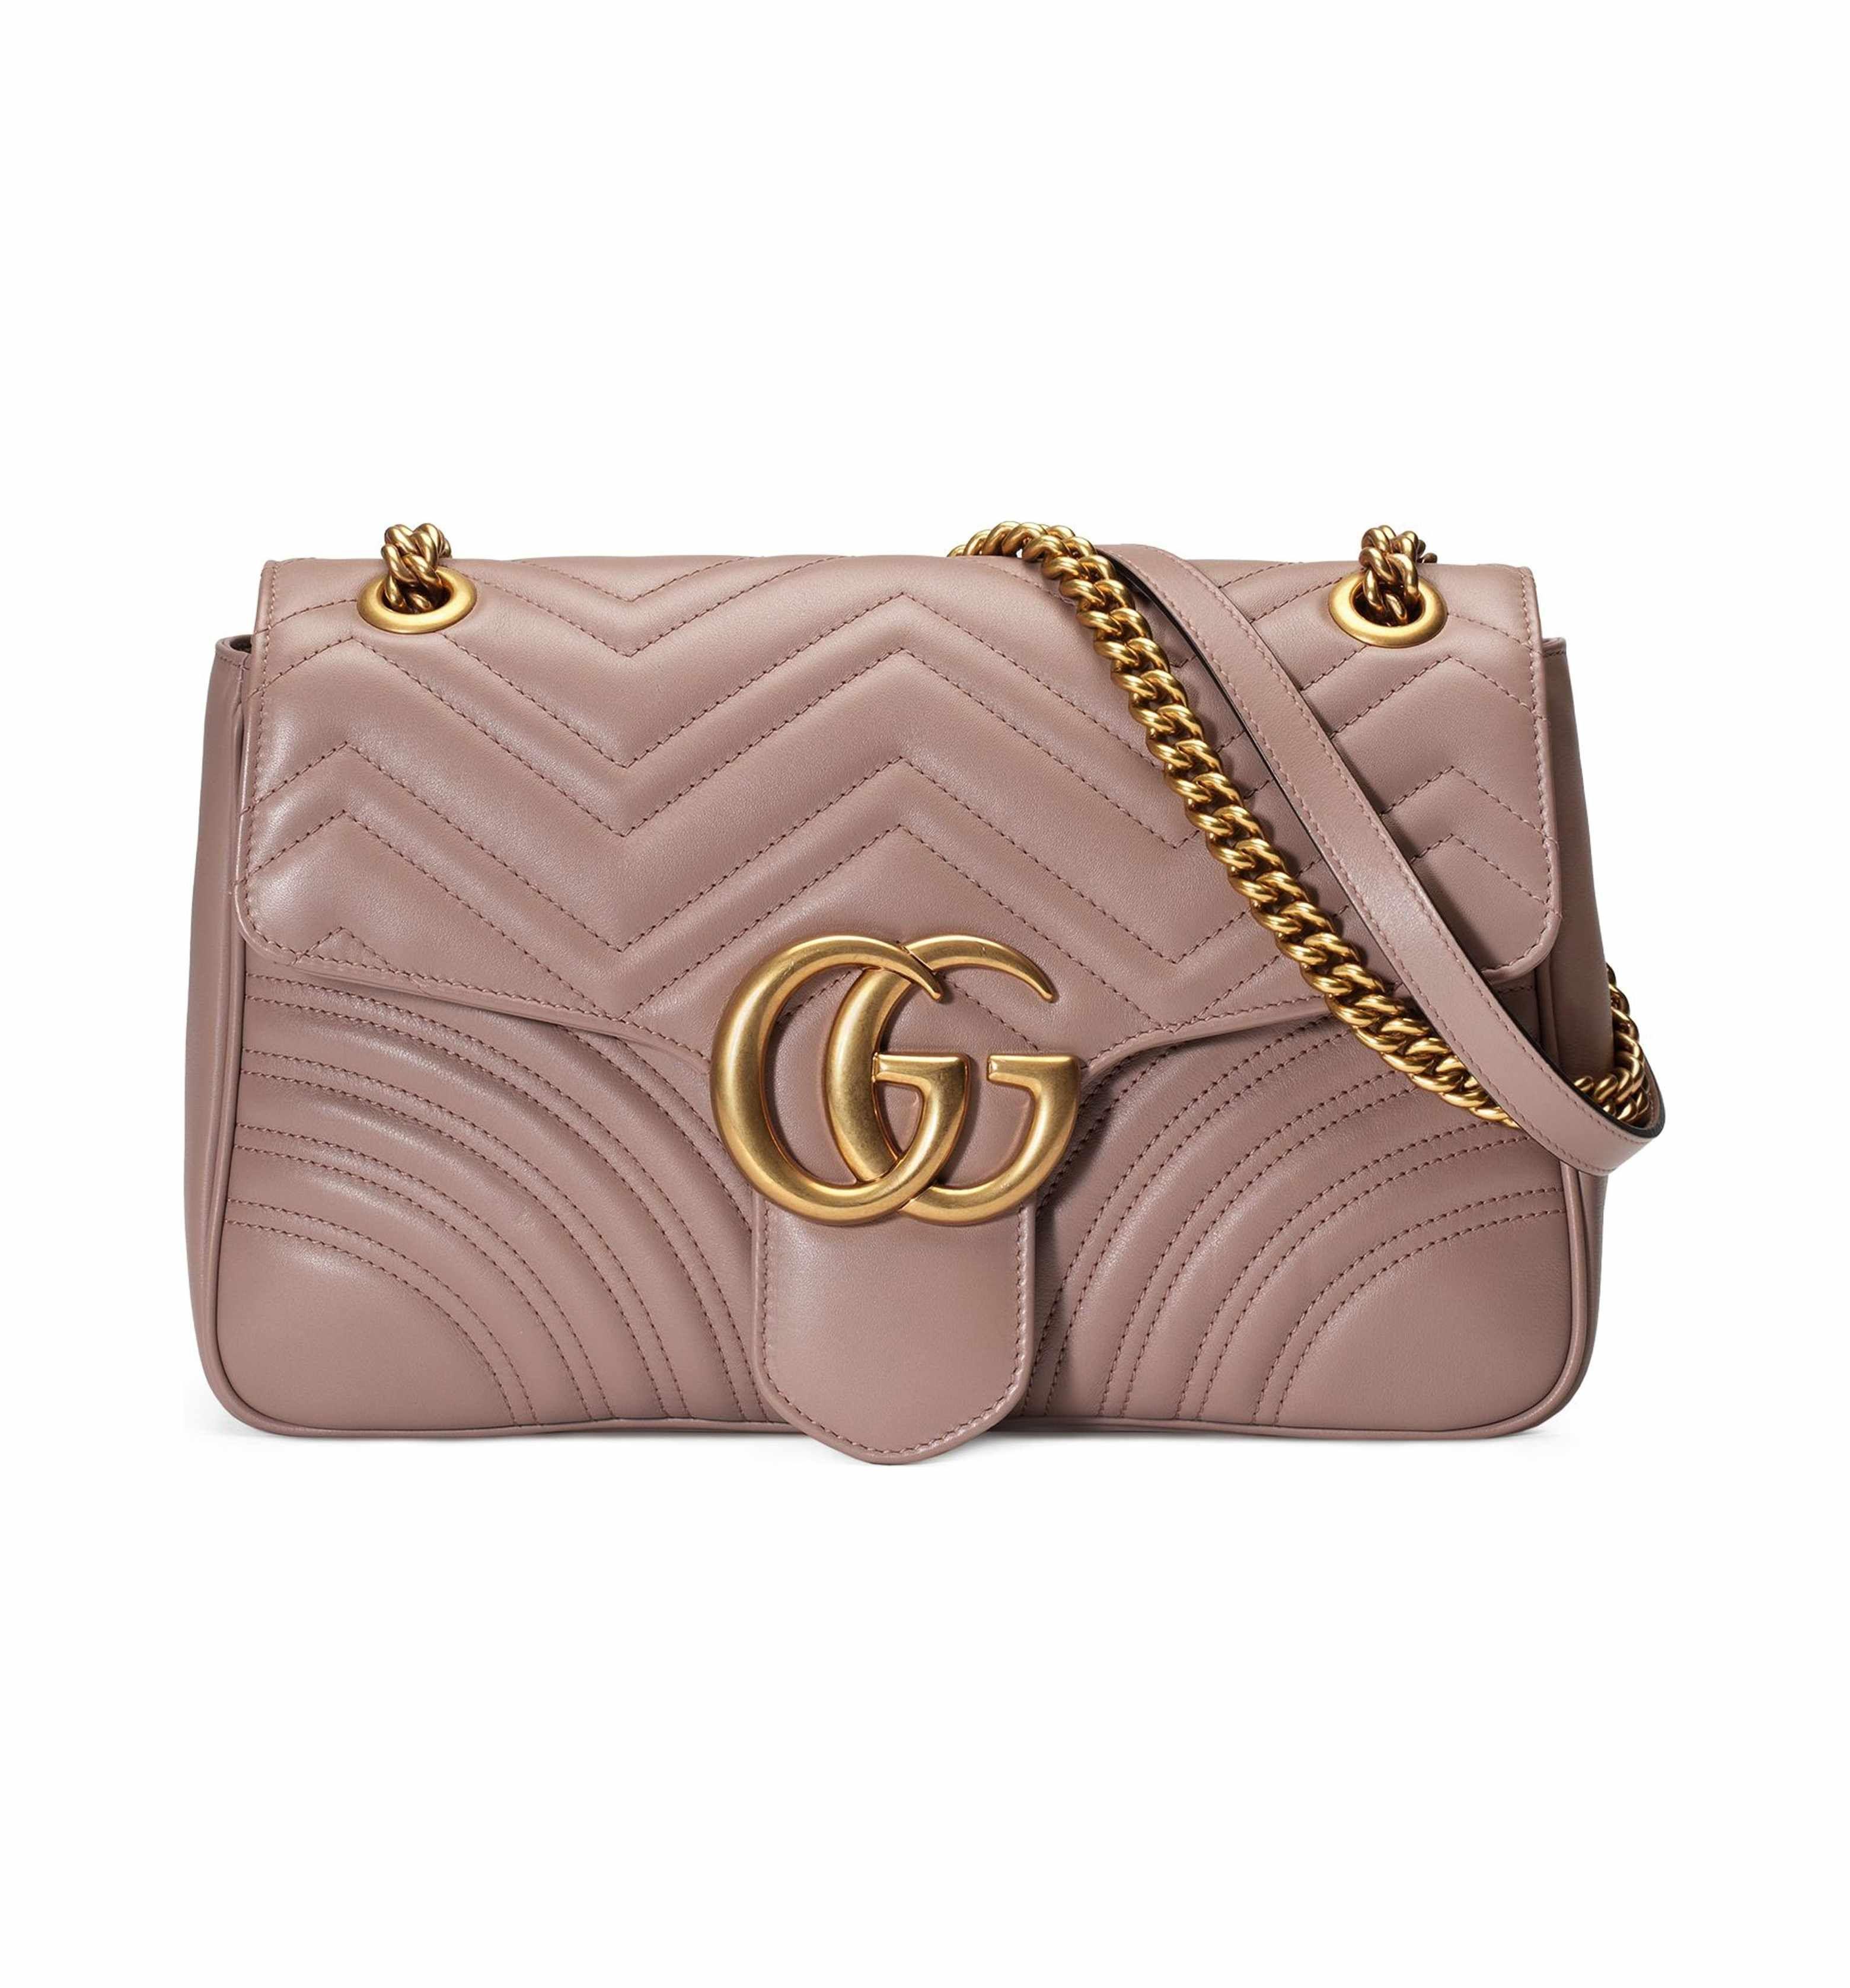 5407f7c33e65ca Main Image - Gucci Medium GG Marmont 2.0 Matelassé Leather Shoulder Bag